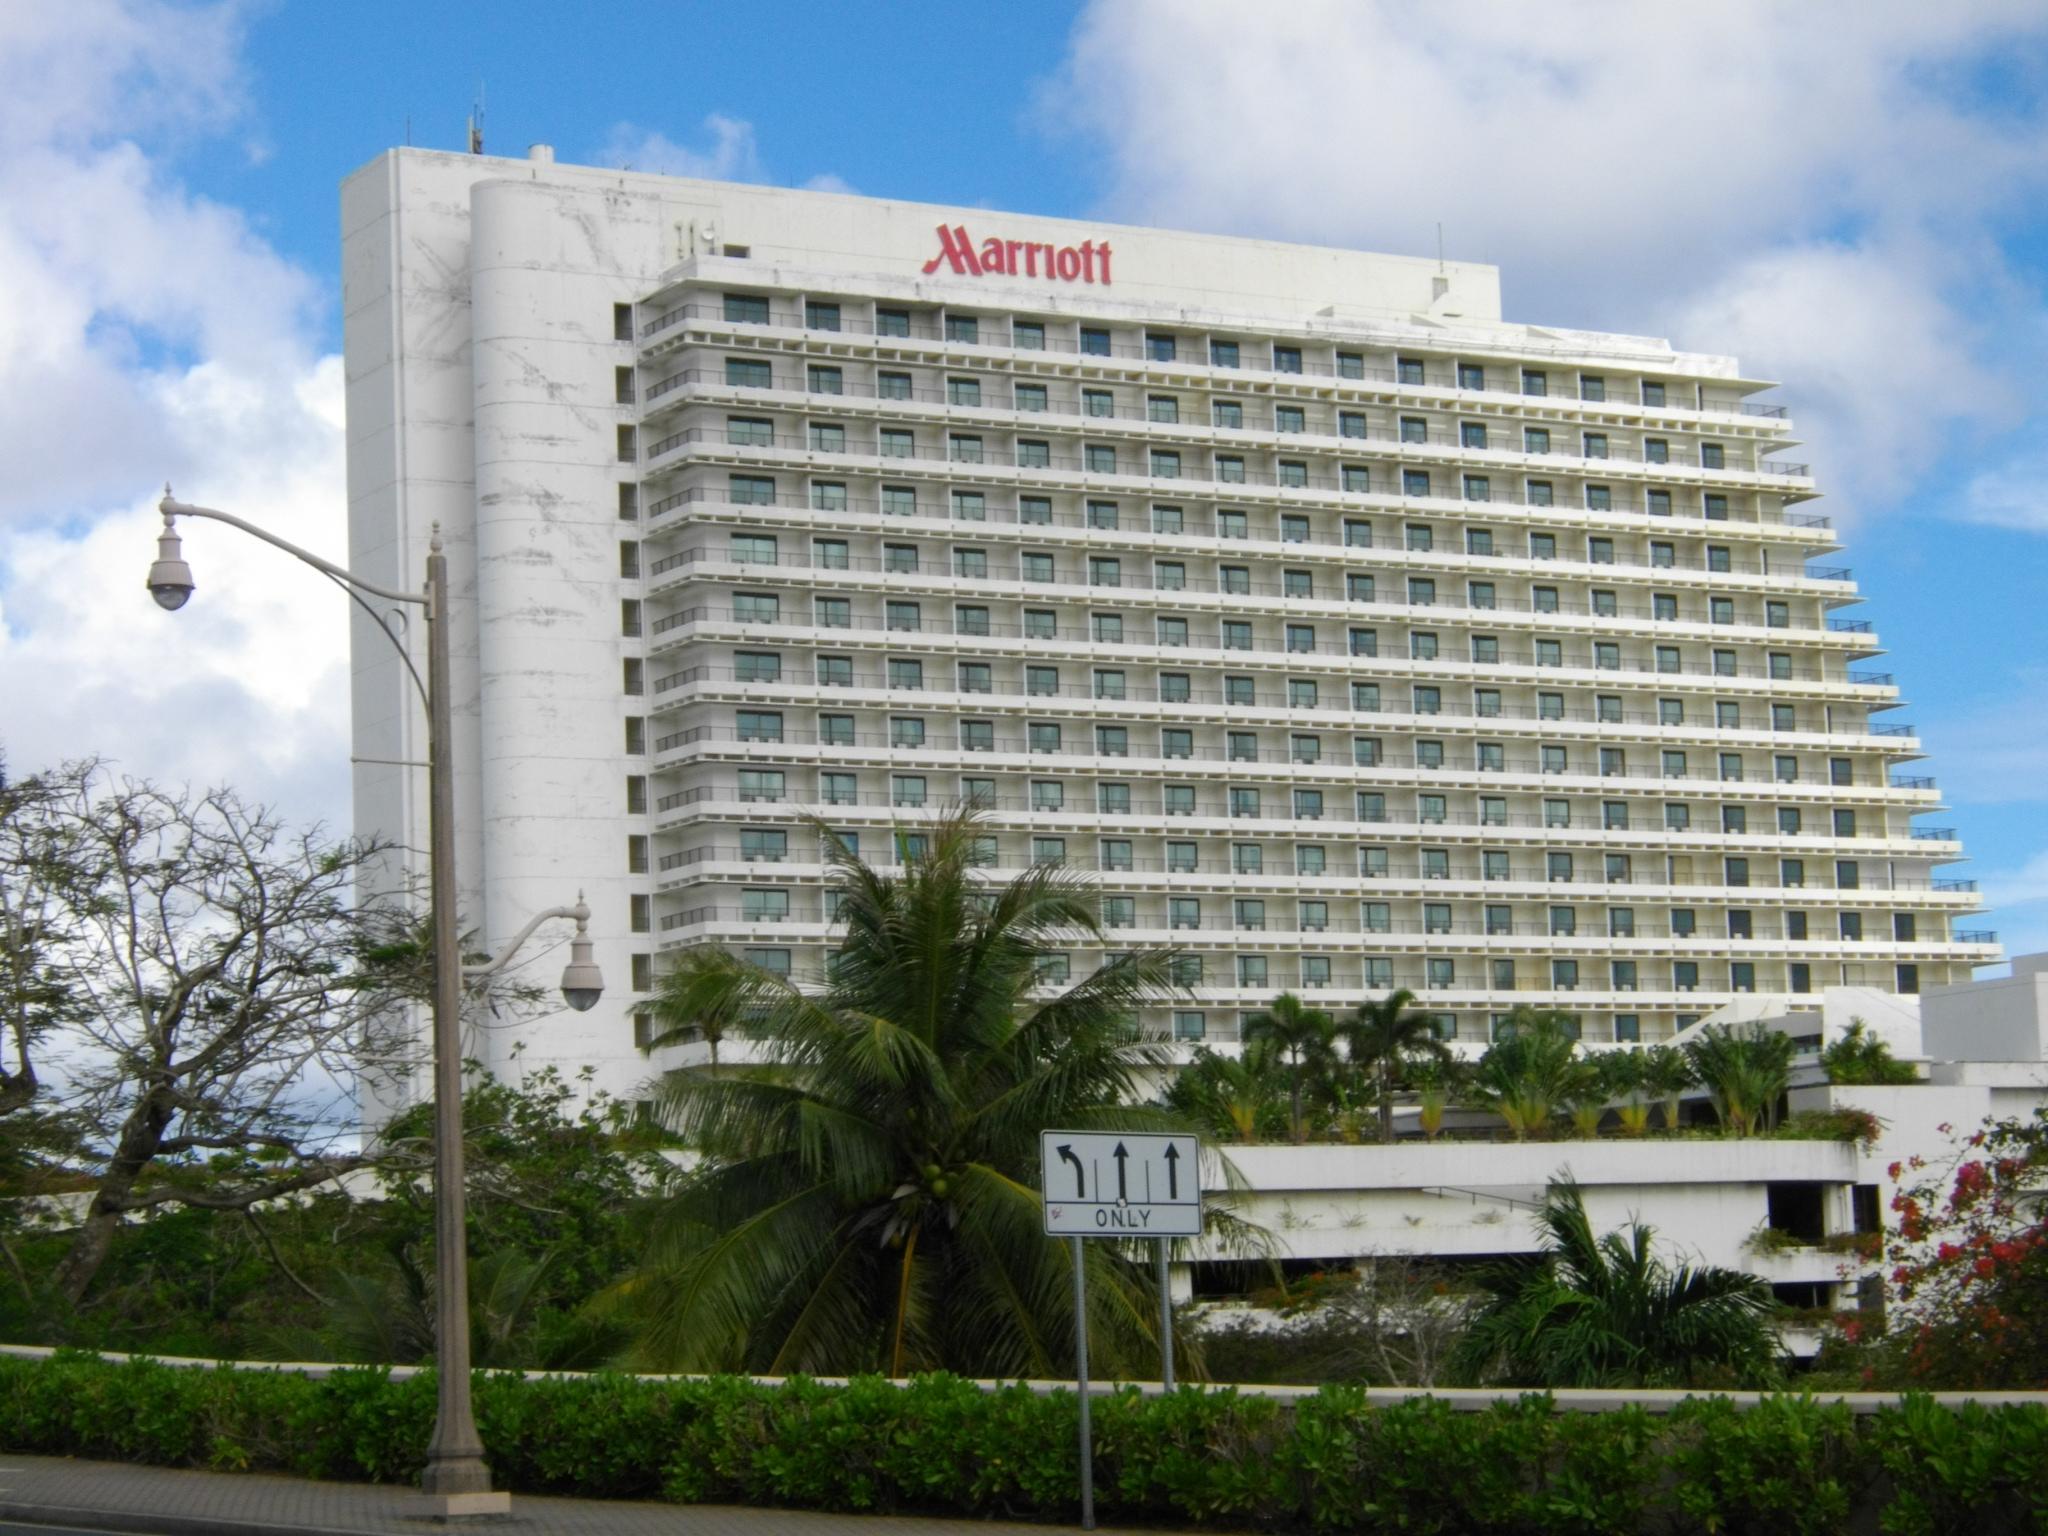 Marriott Hotel And Spa Niagara Falls